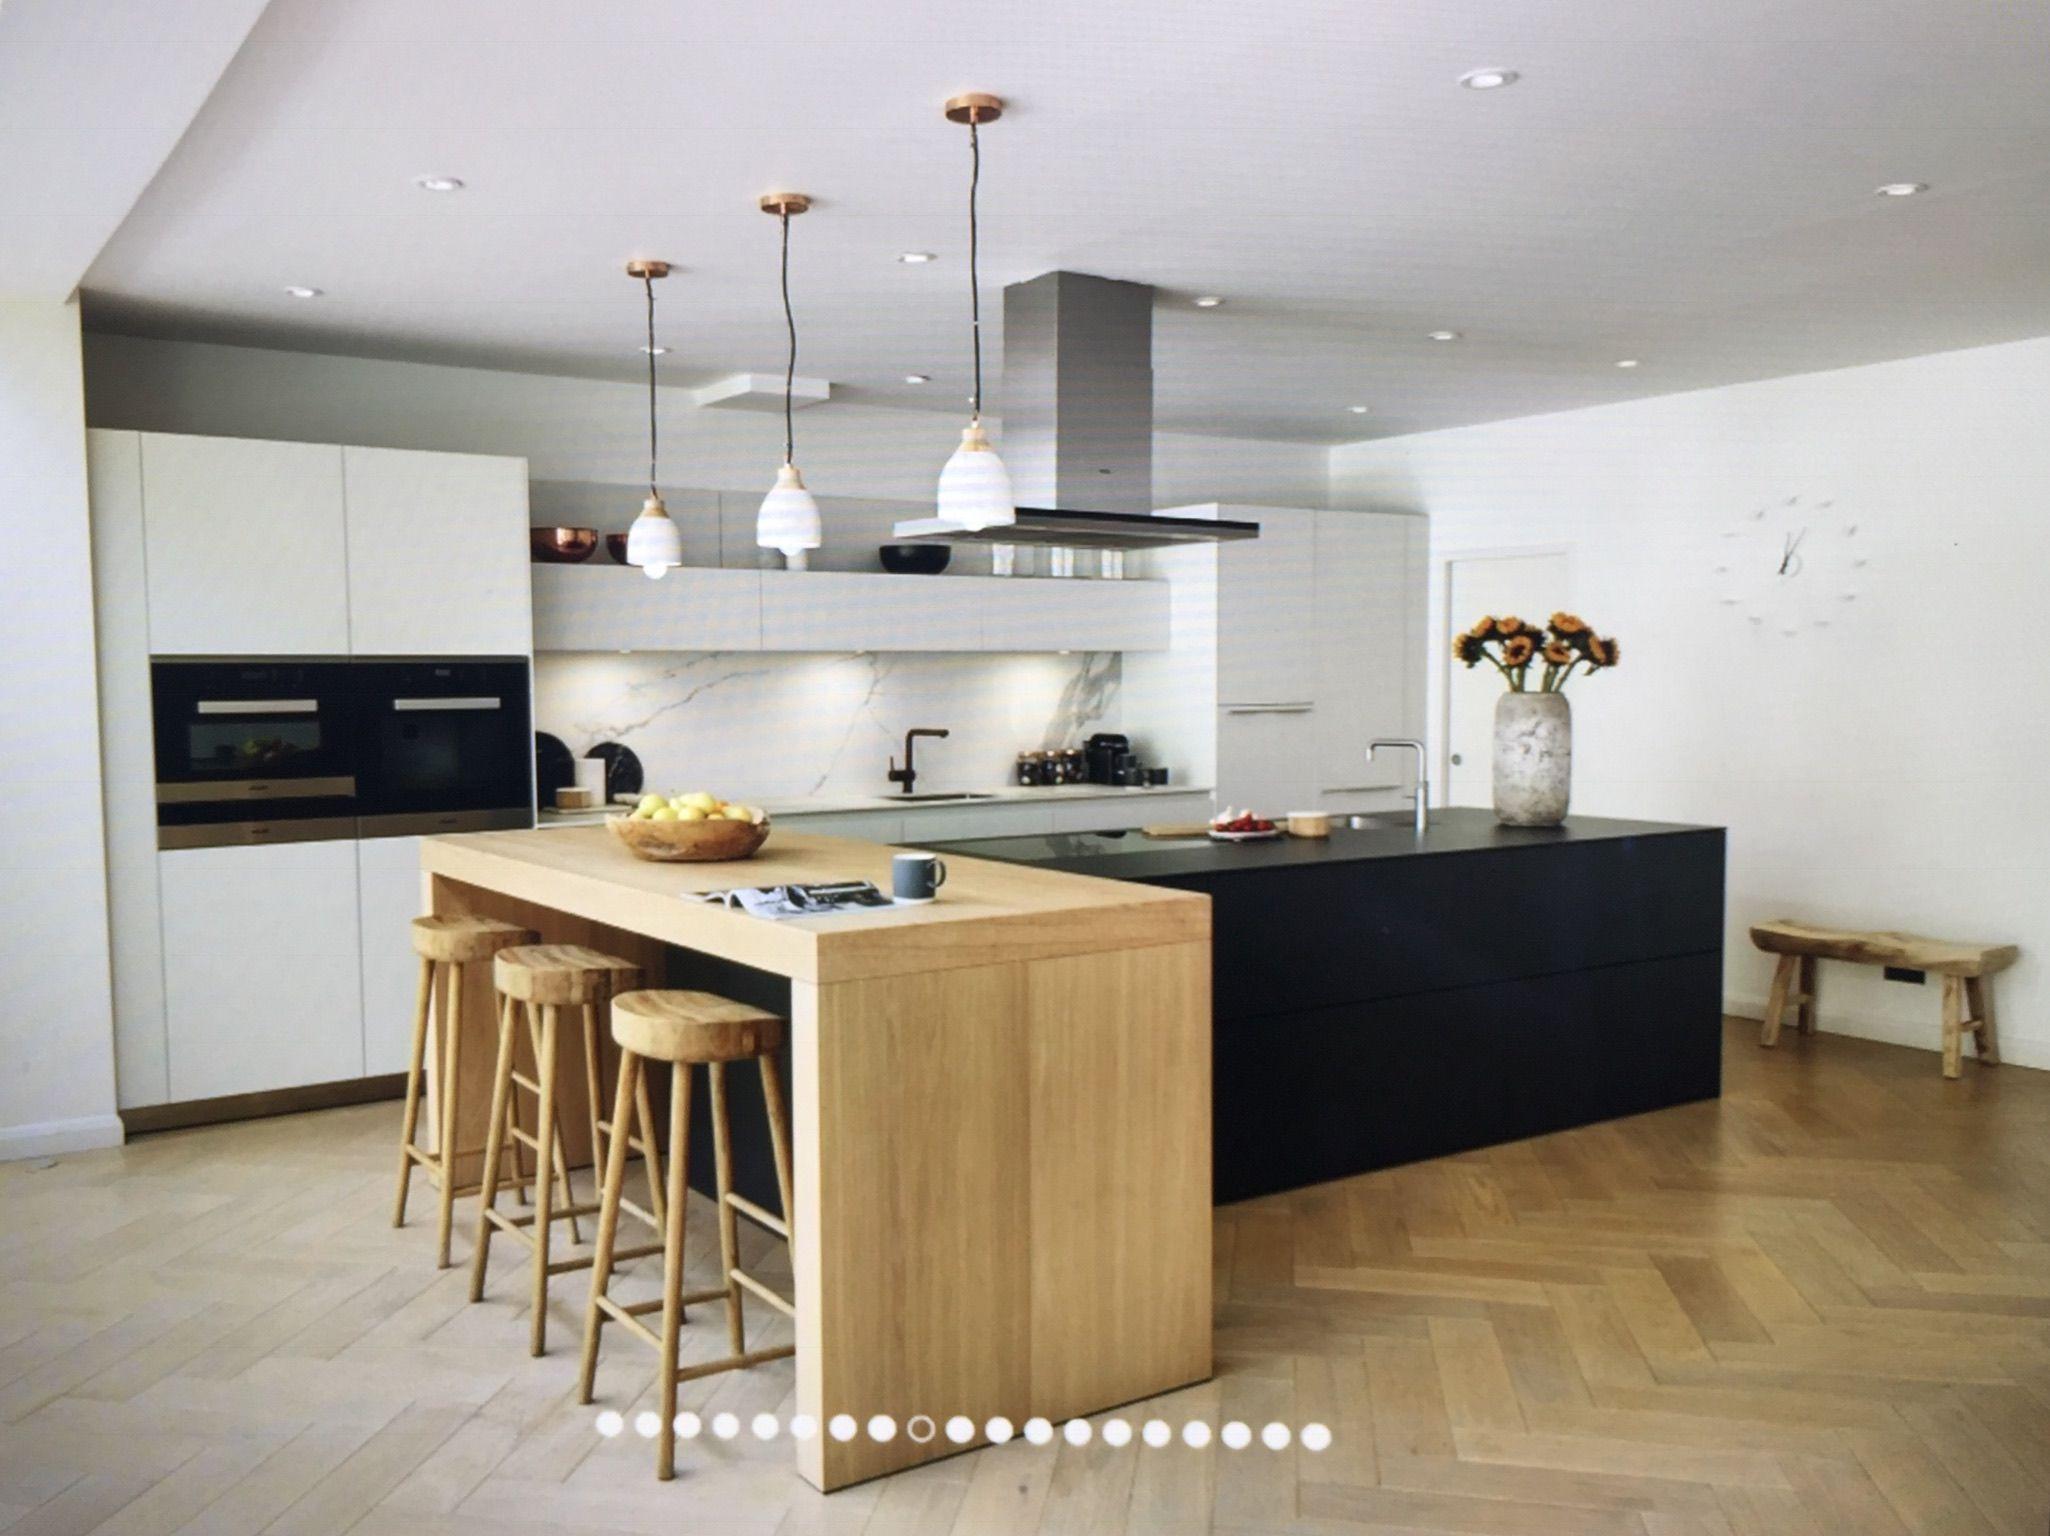 Bulthaup Tresen Holz 90 Grad zur Insel Small kitchen